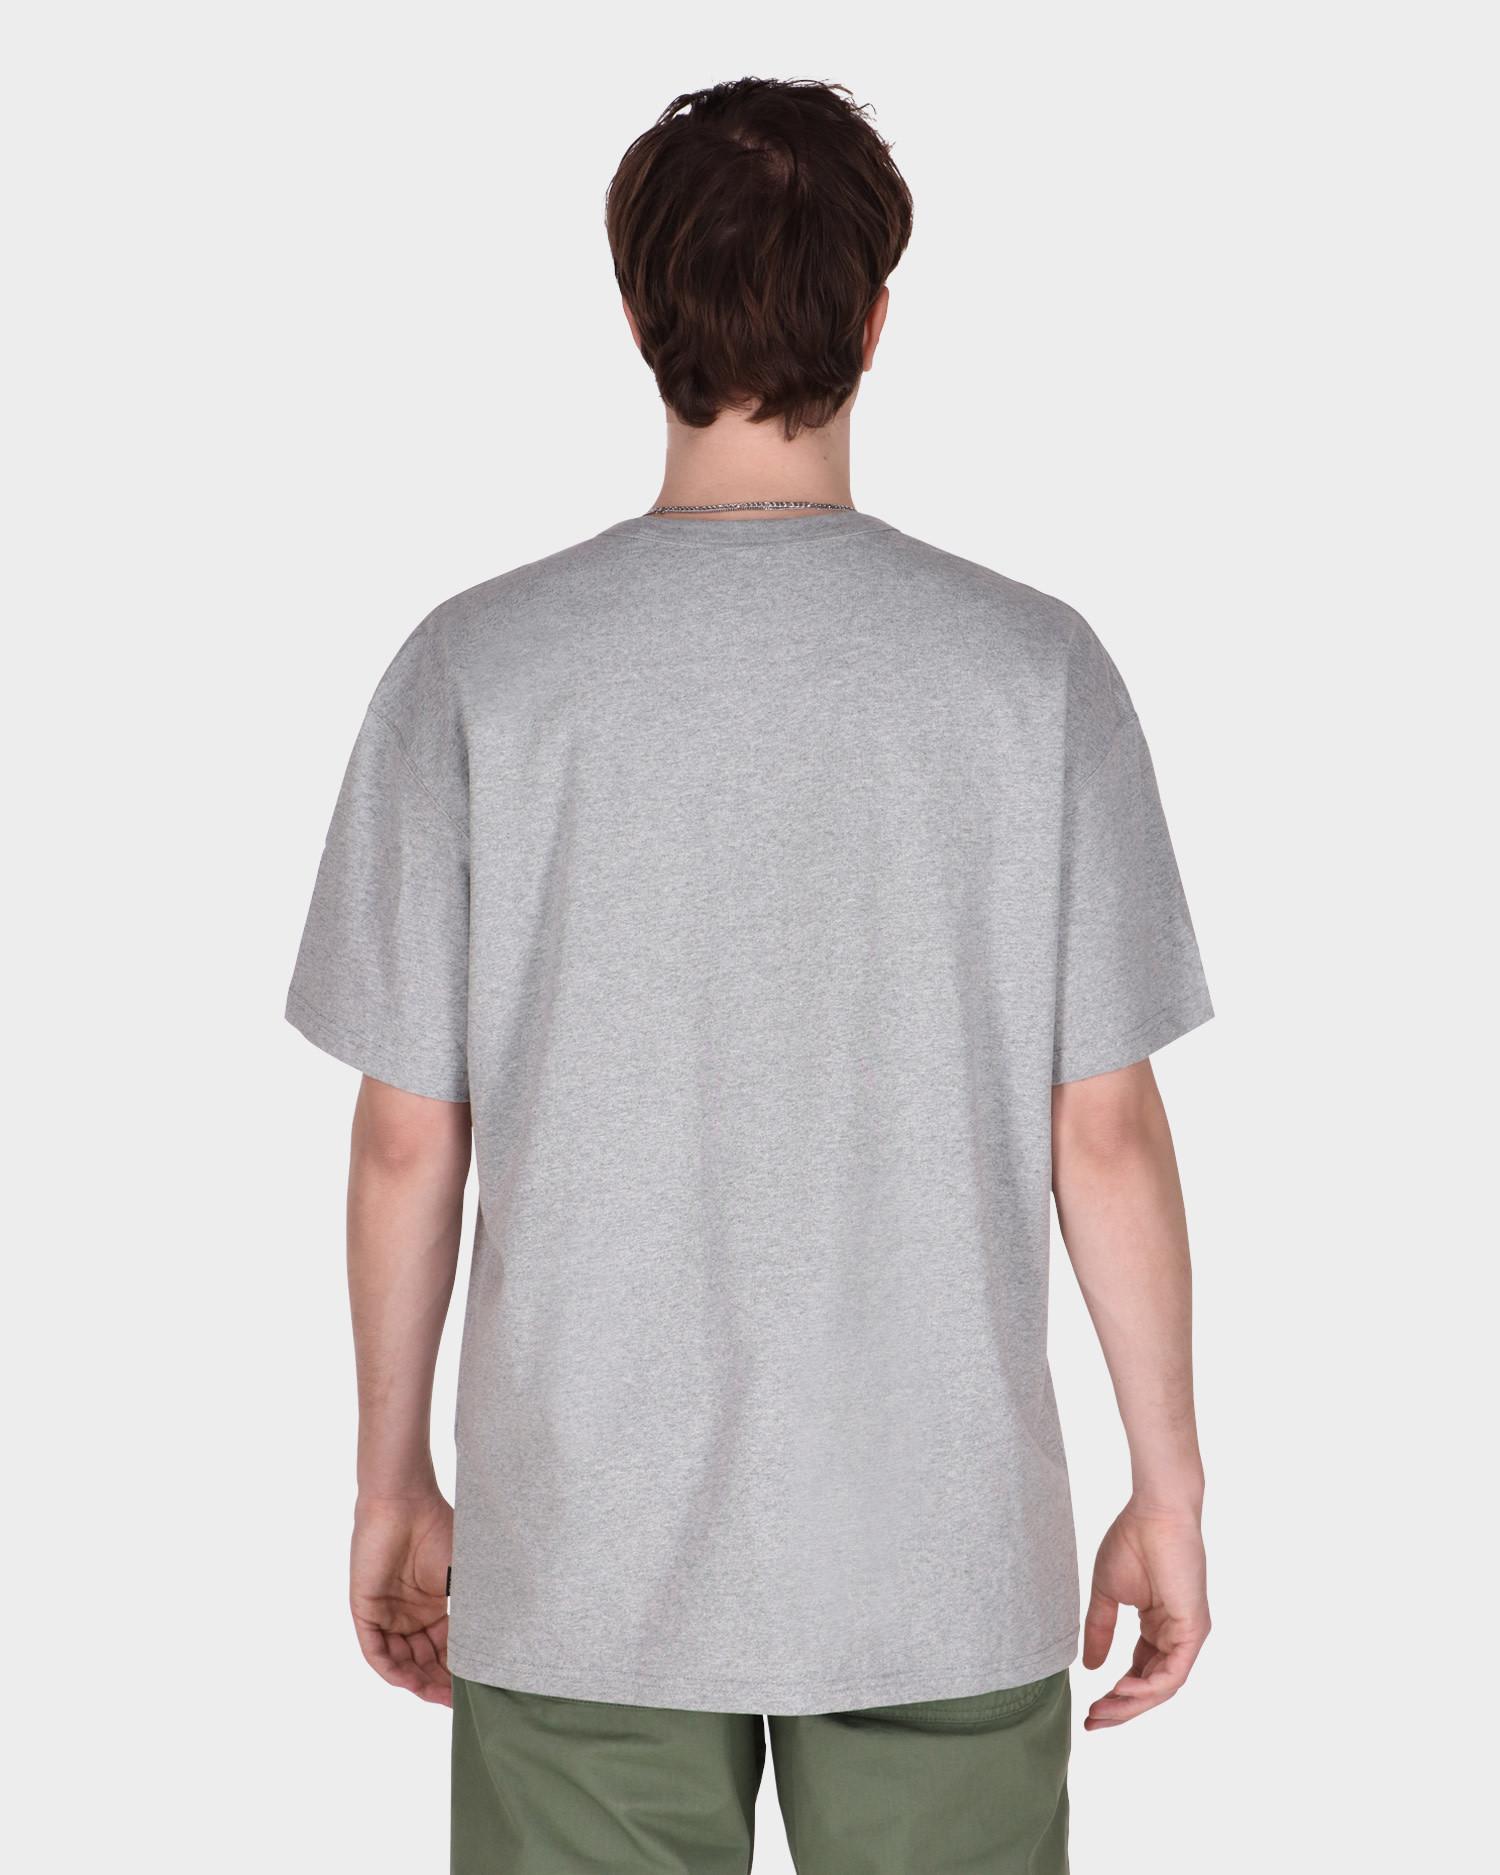 Nike Sportswear Premium Essential T-Shirt DK Grey Heather